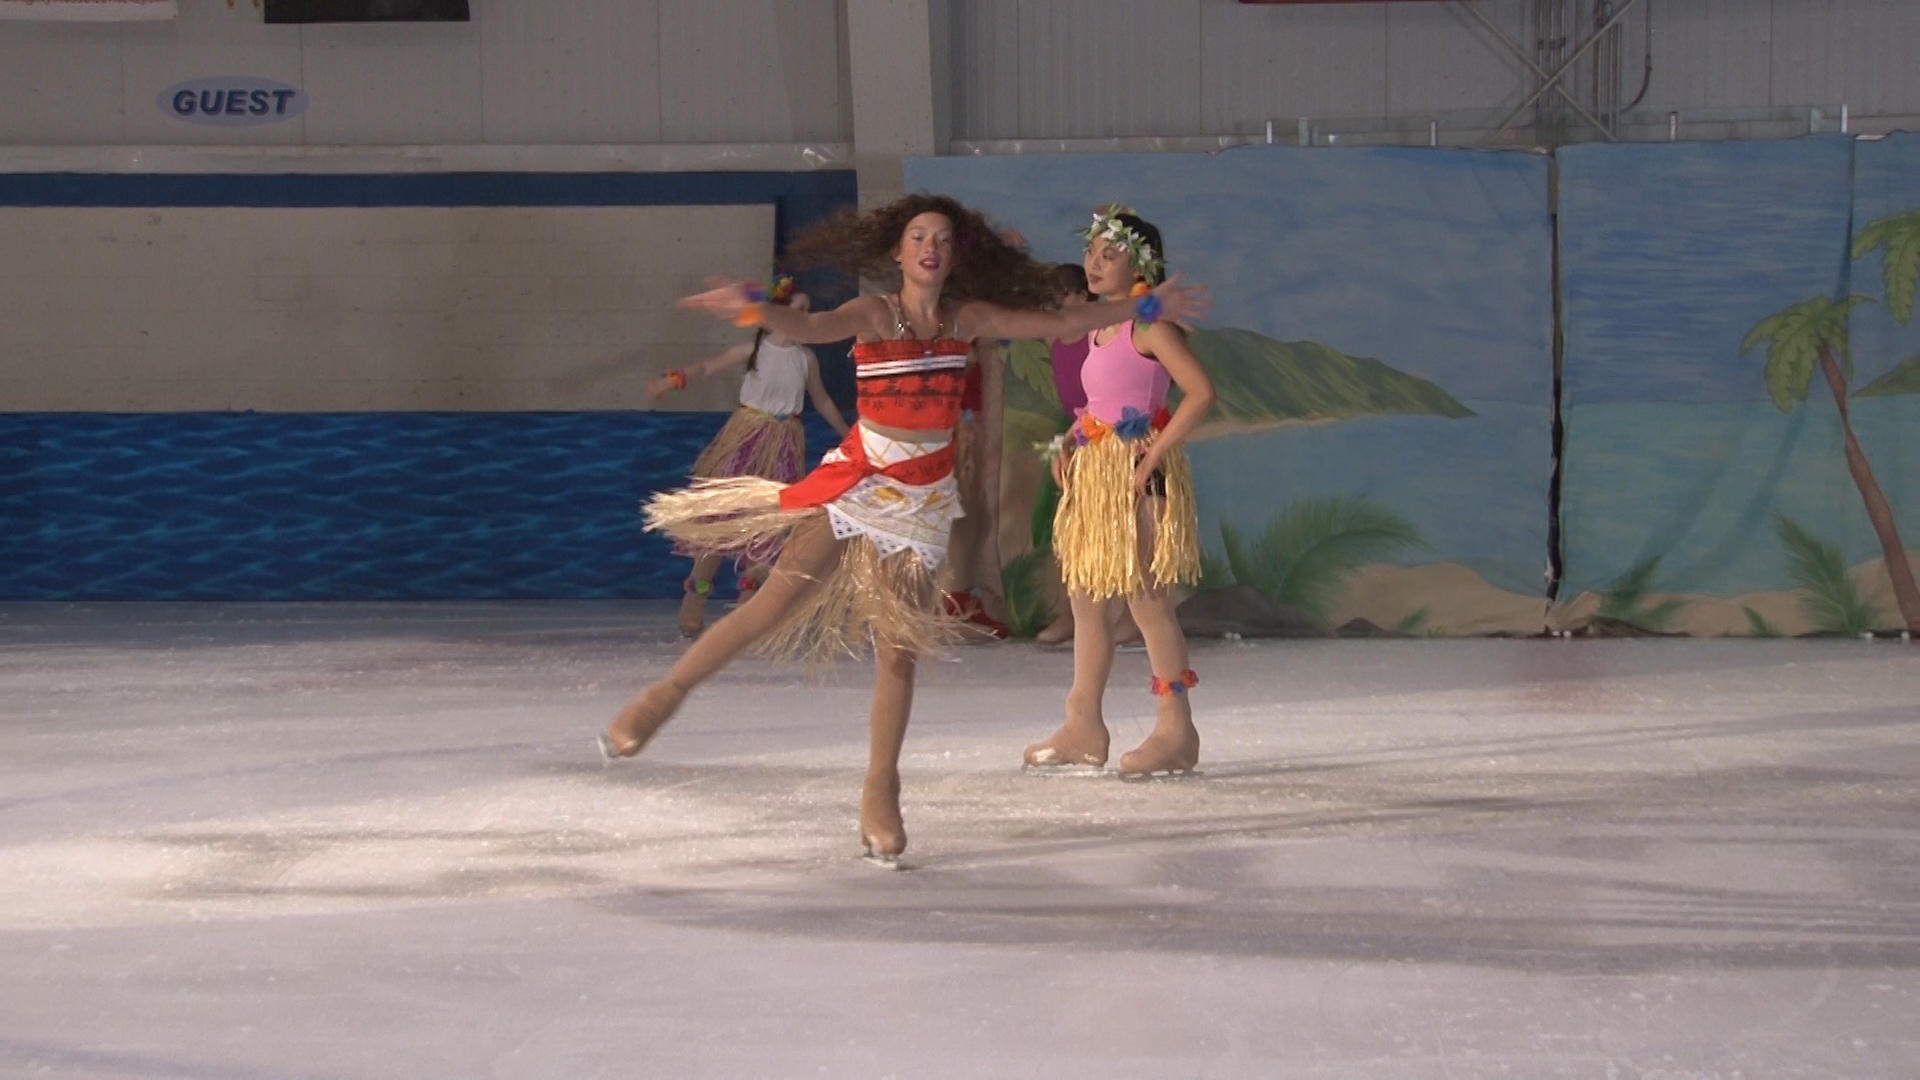 Power Play Maui Skate on Ice 071417.00_17_45_16.Still034.jpg